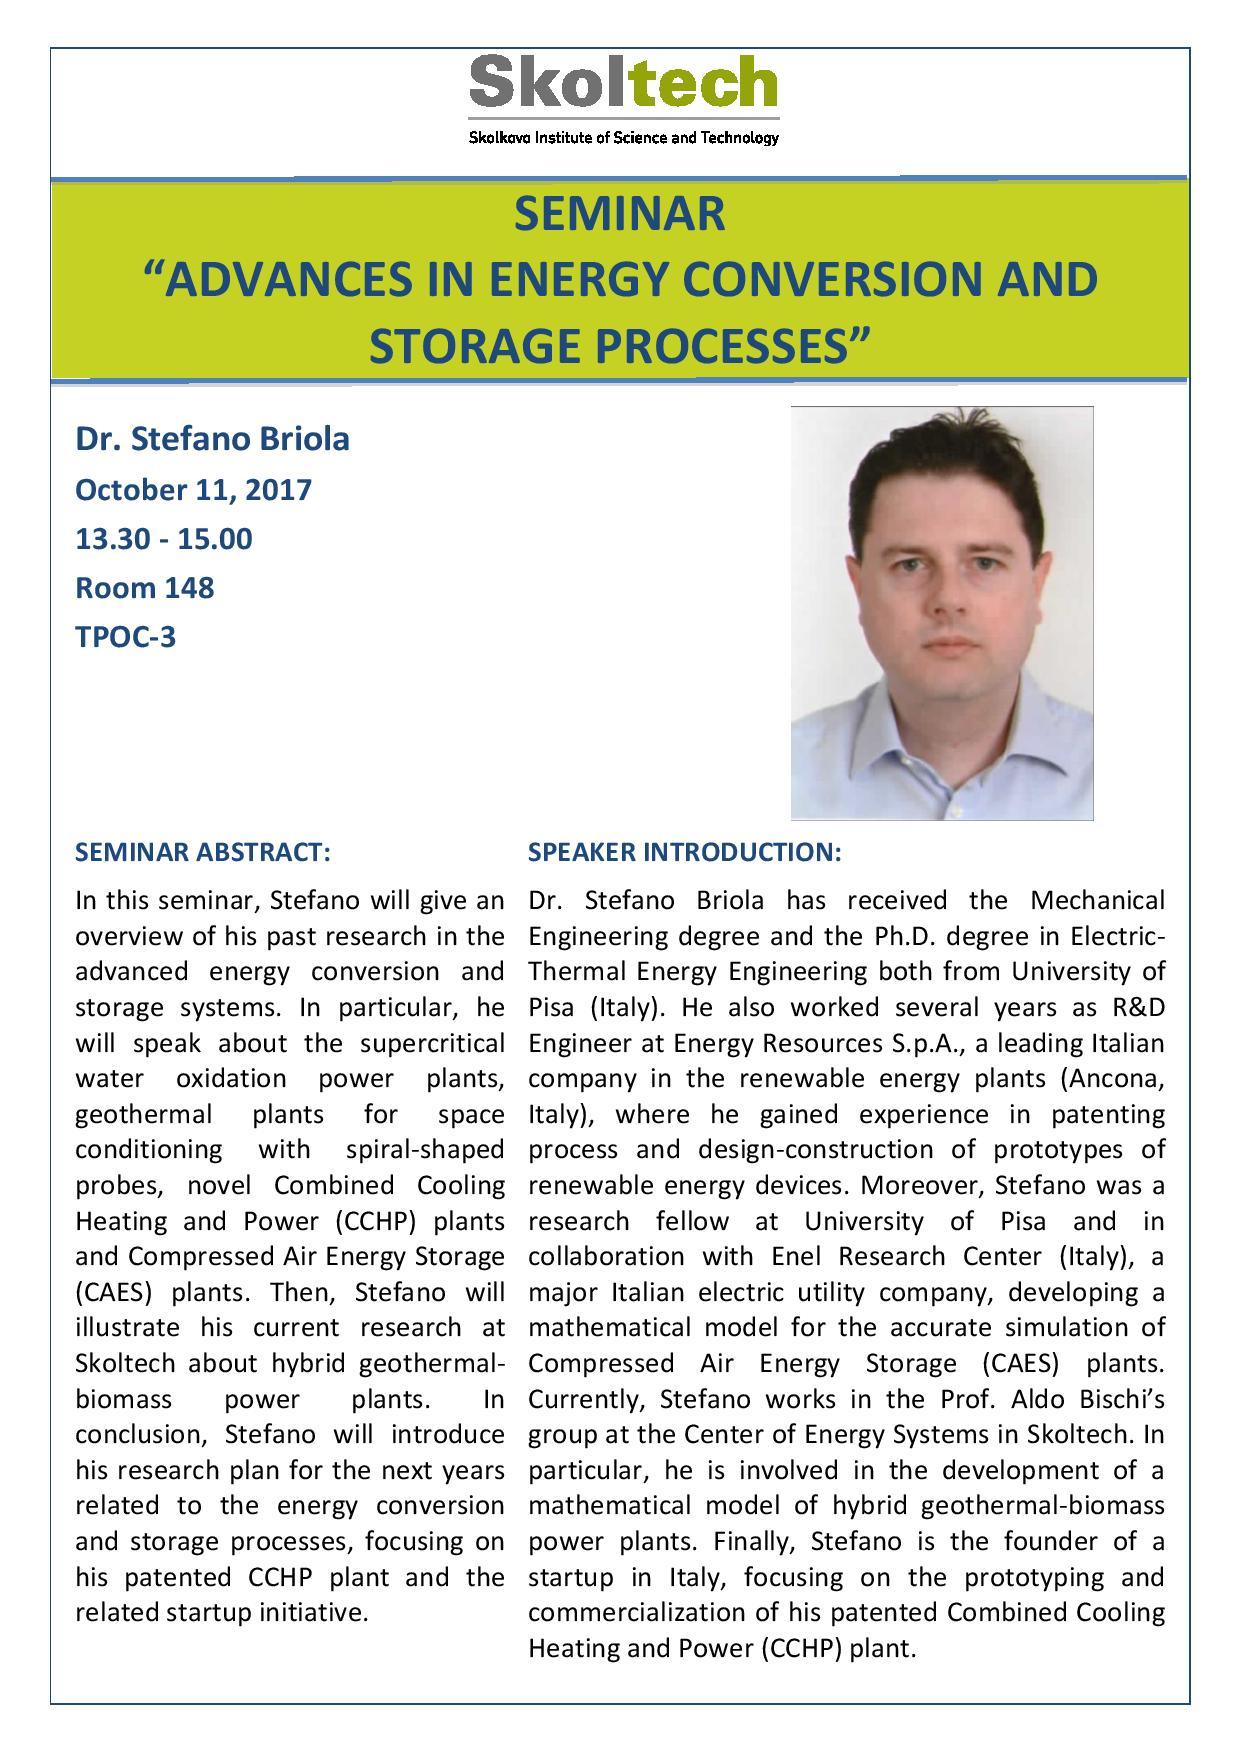 dr-stefano-briola-october-11-seminar-announcement-ib-page-001